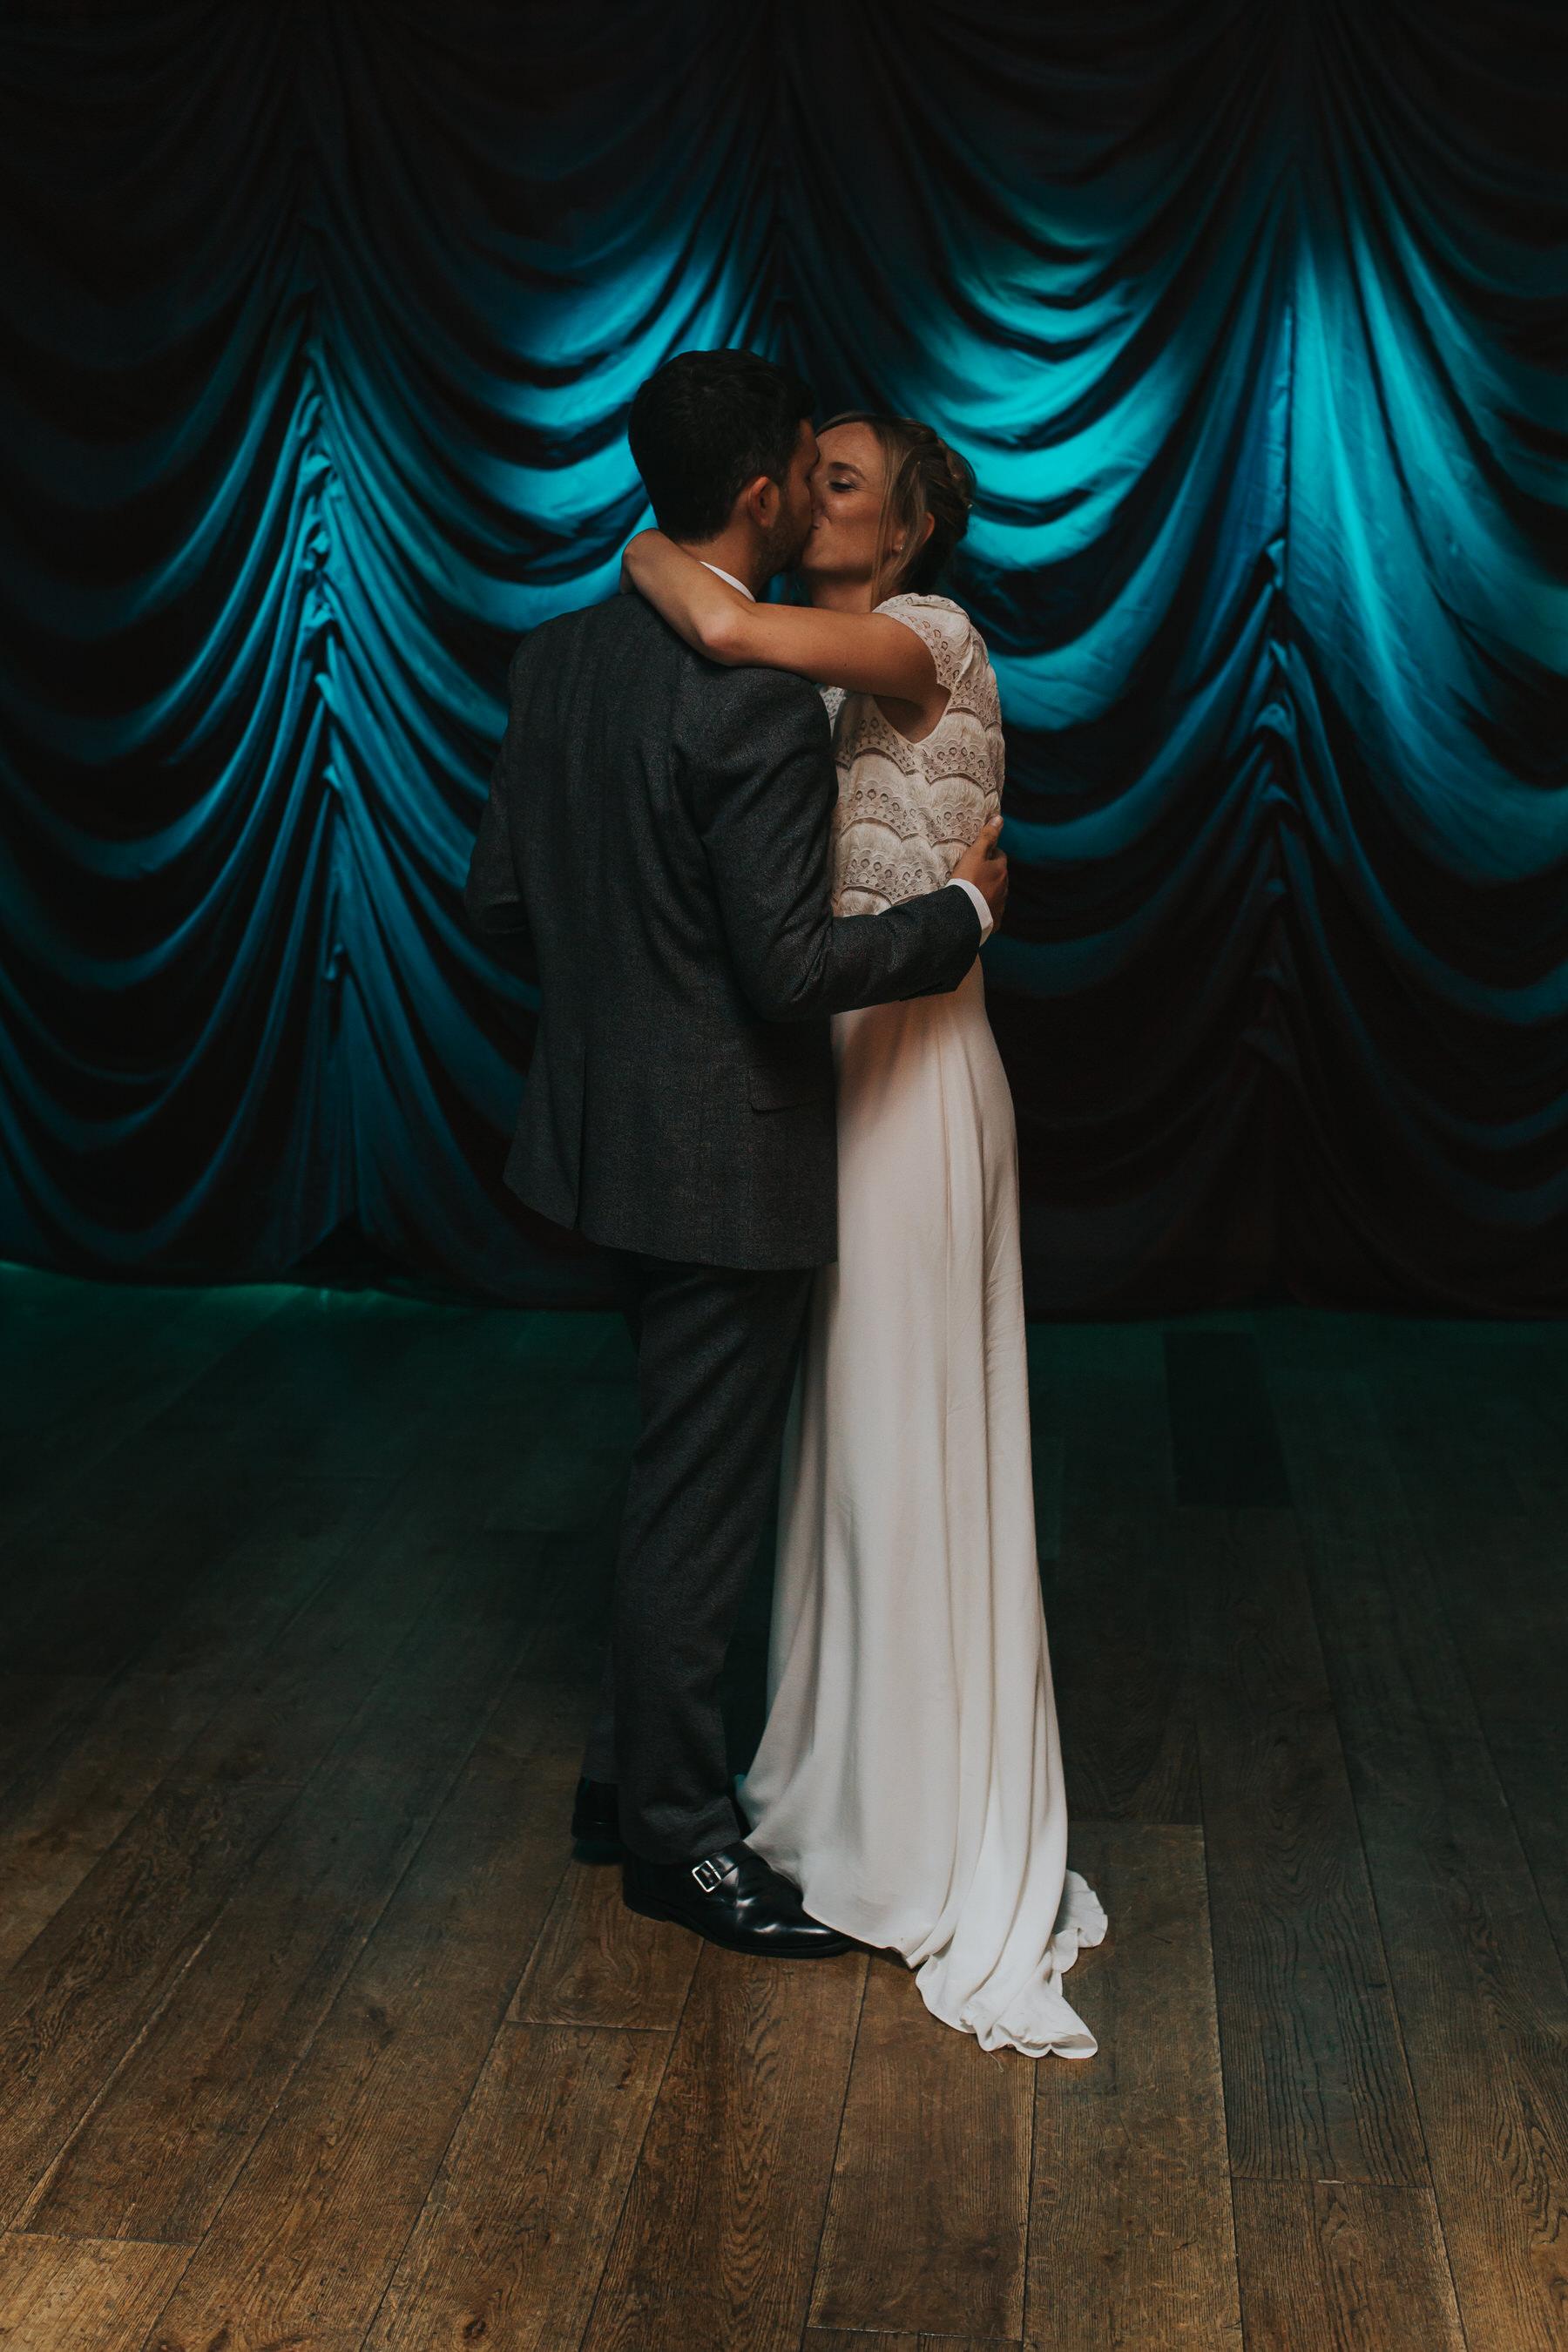 Century club bride groom first dance.jpg